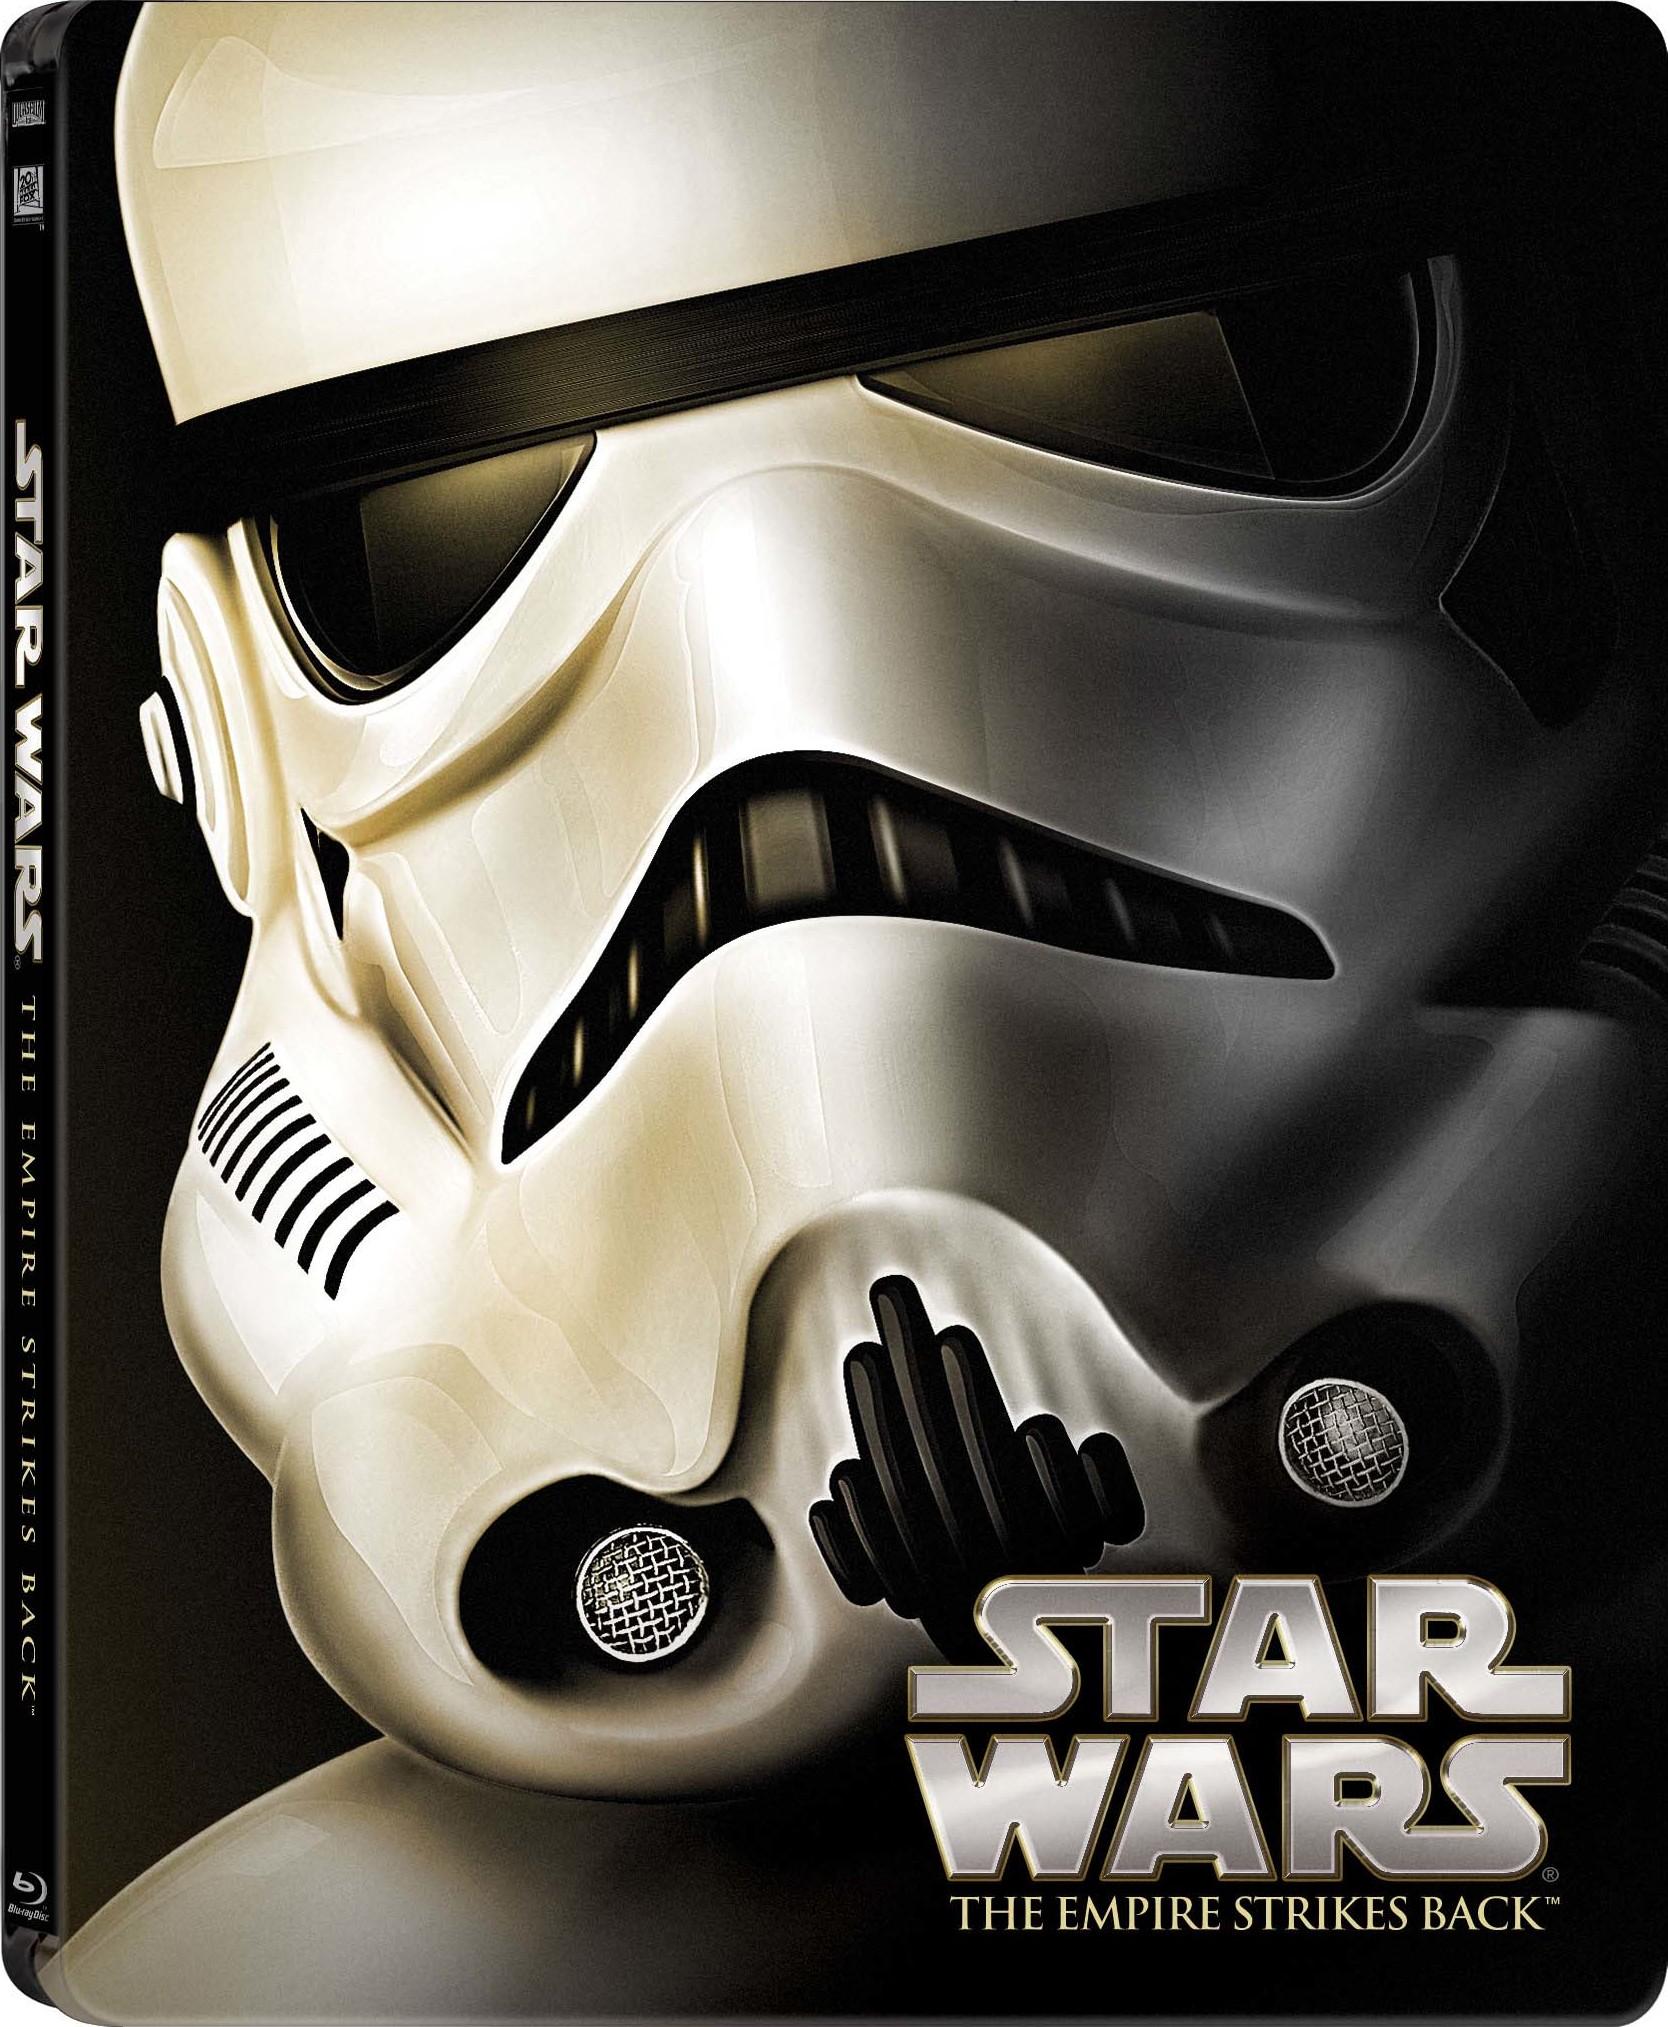 Star Wars The Empire Strikes Back SteelBook